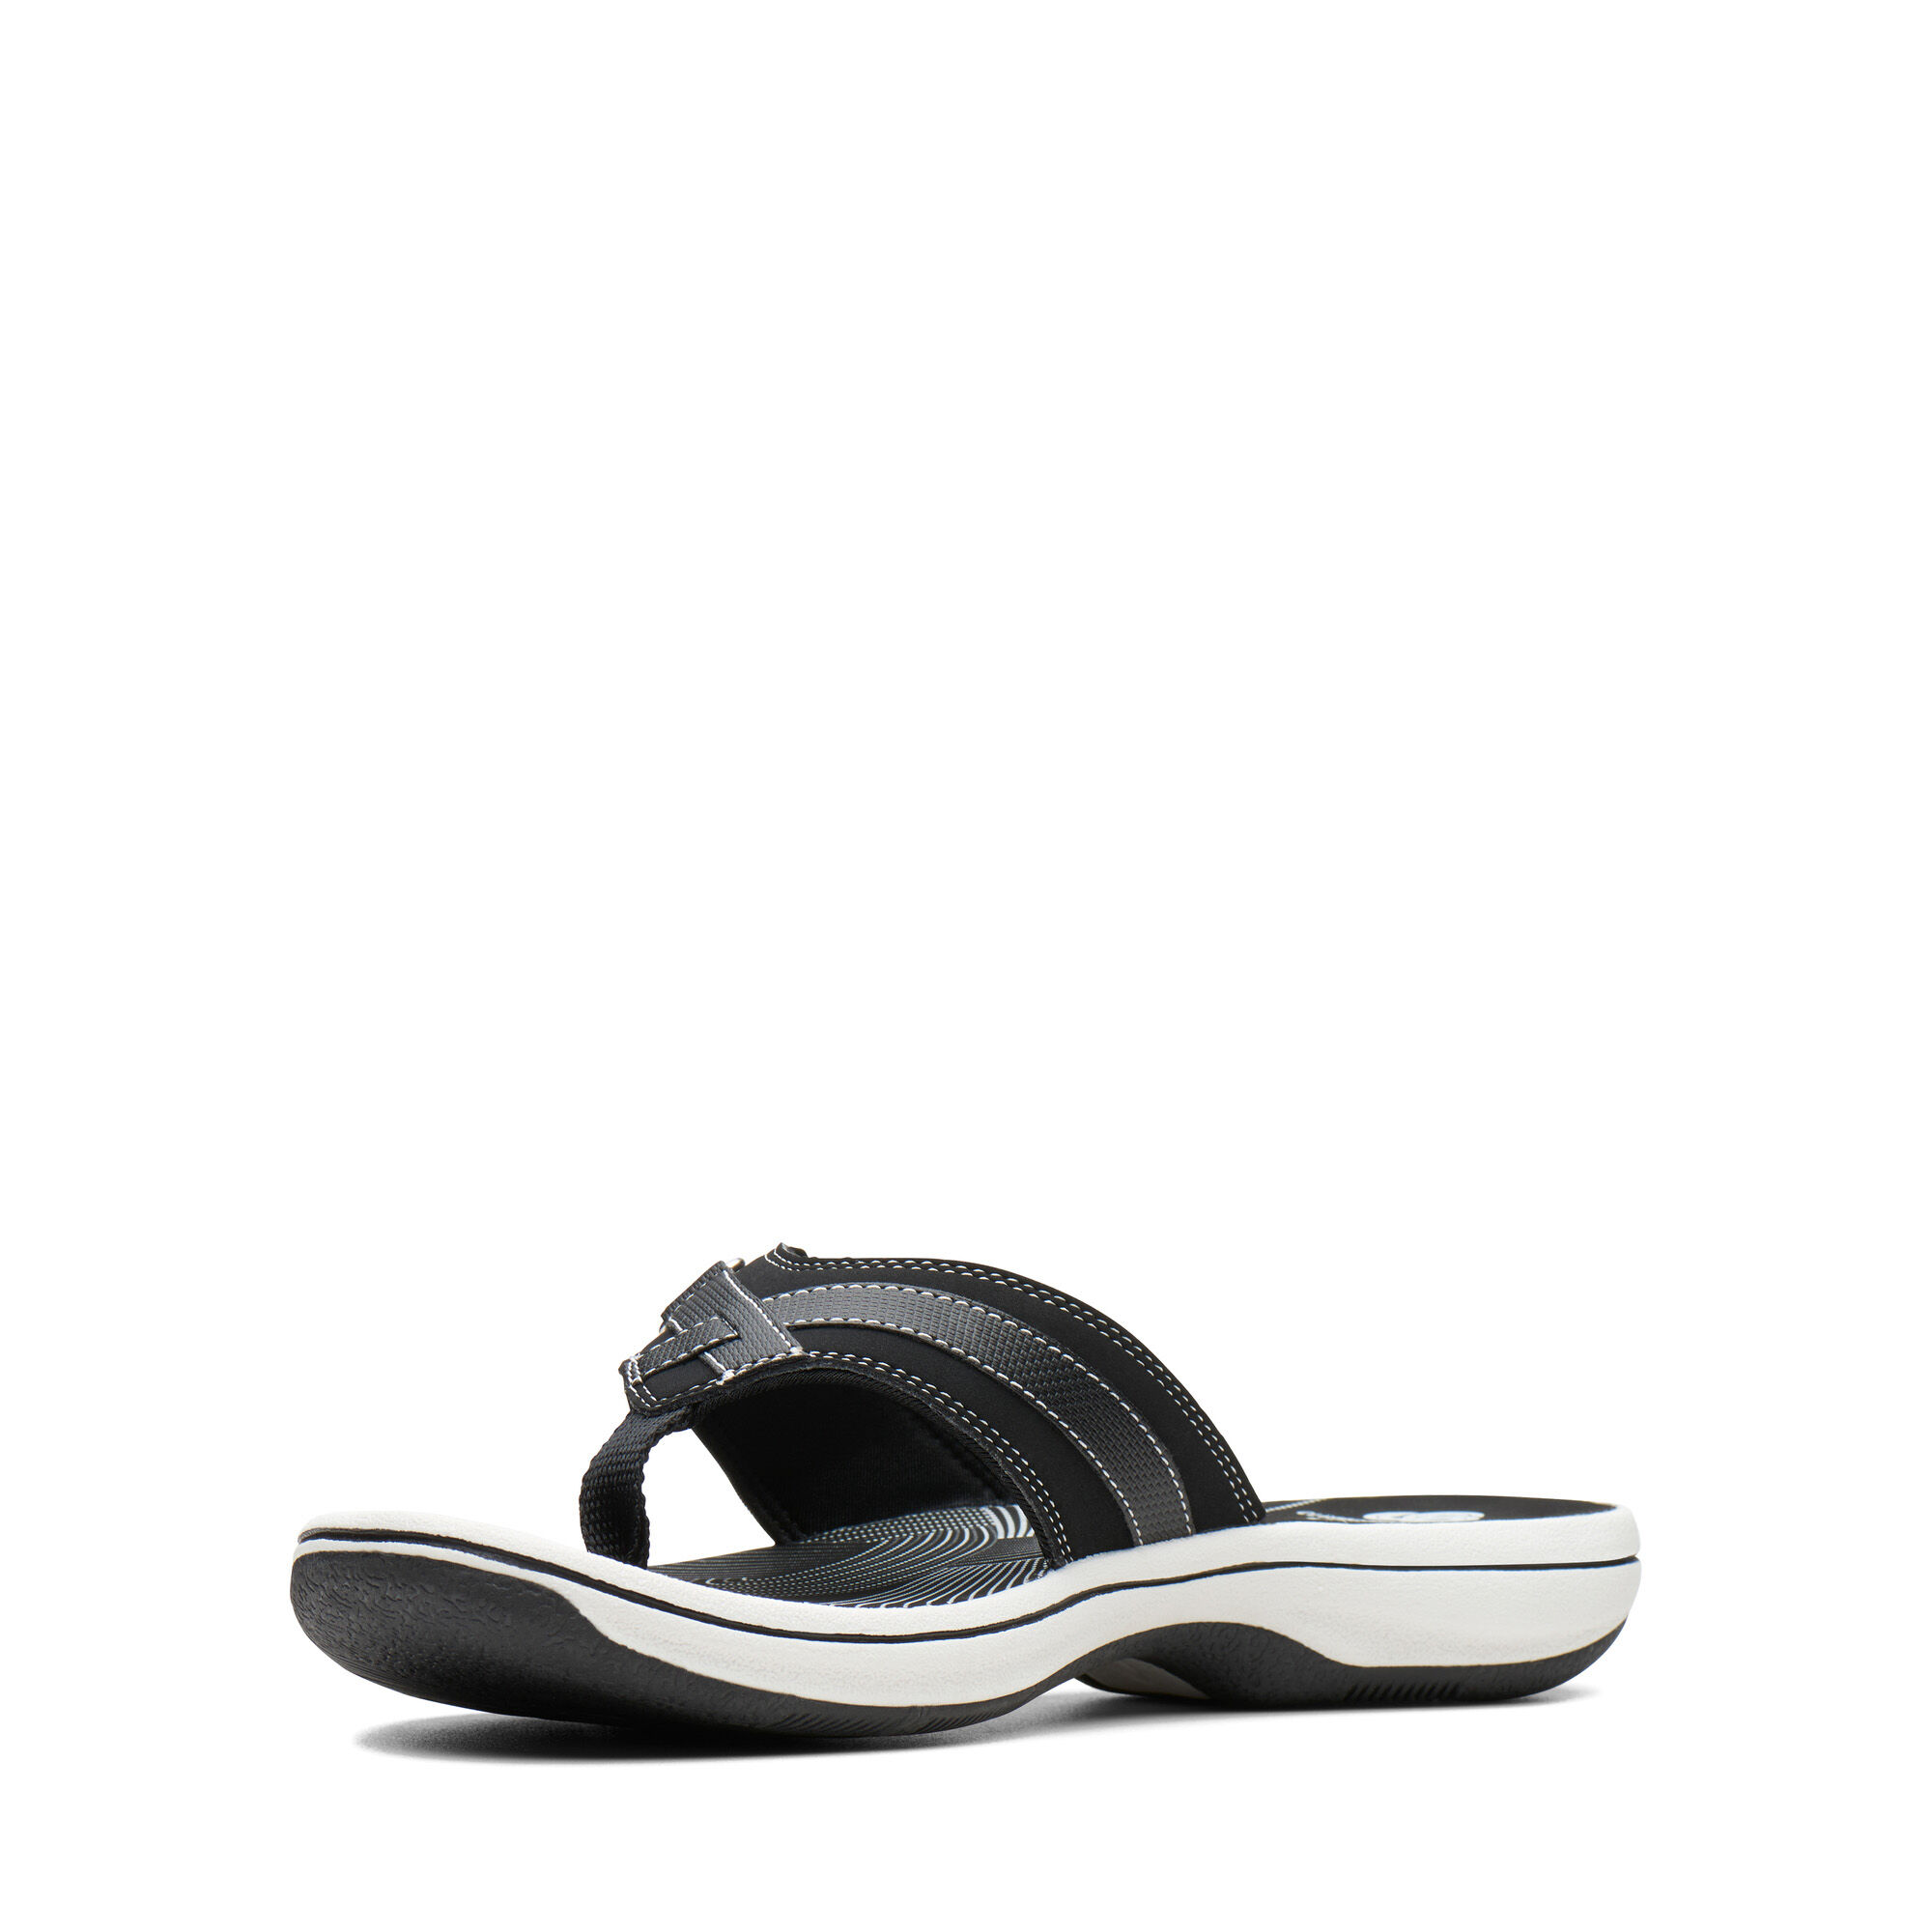 Women's Black Synthetic Sandals